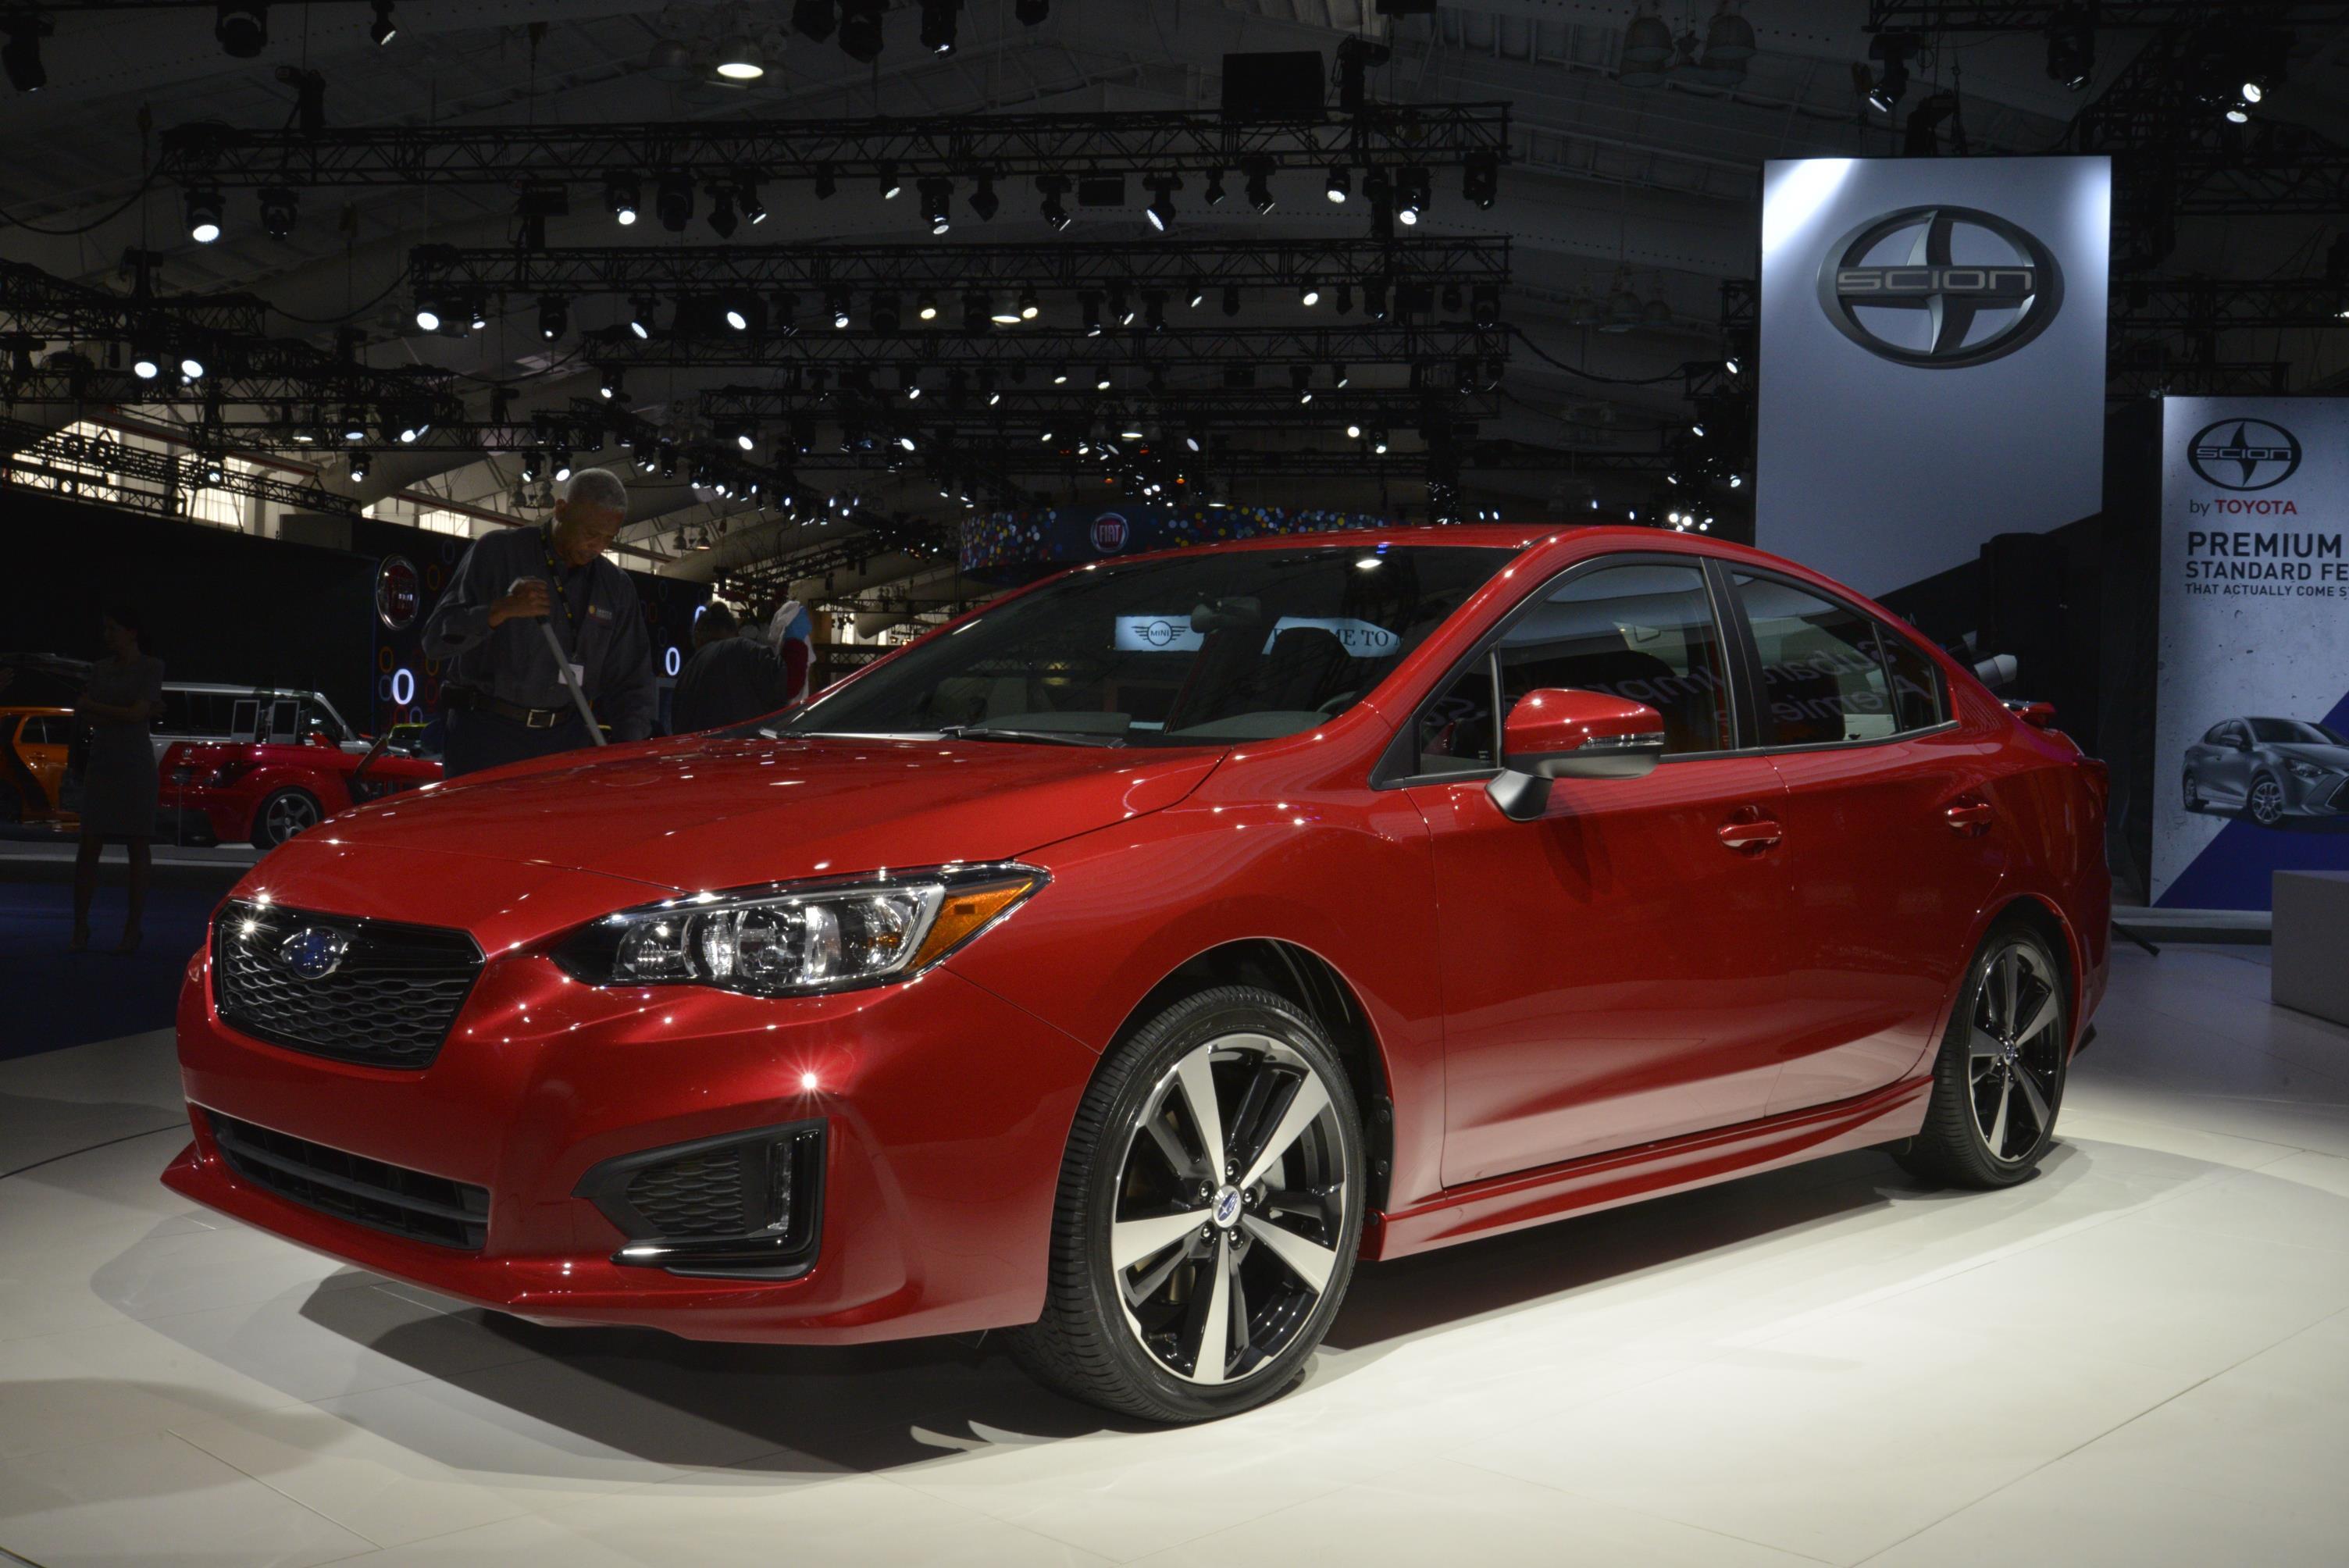 Updated 2013 Subaru Wrx Proves Impressive Before